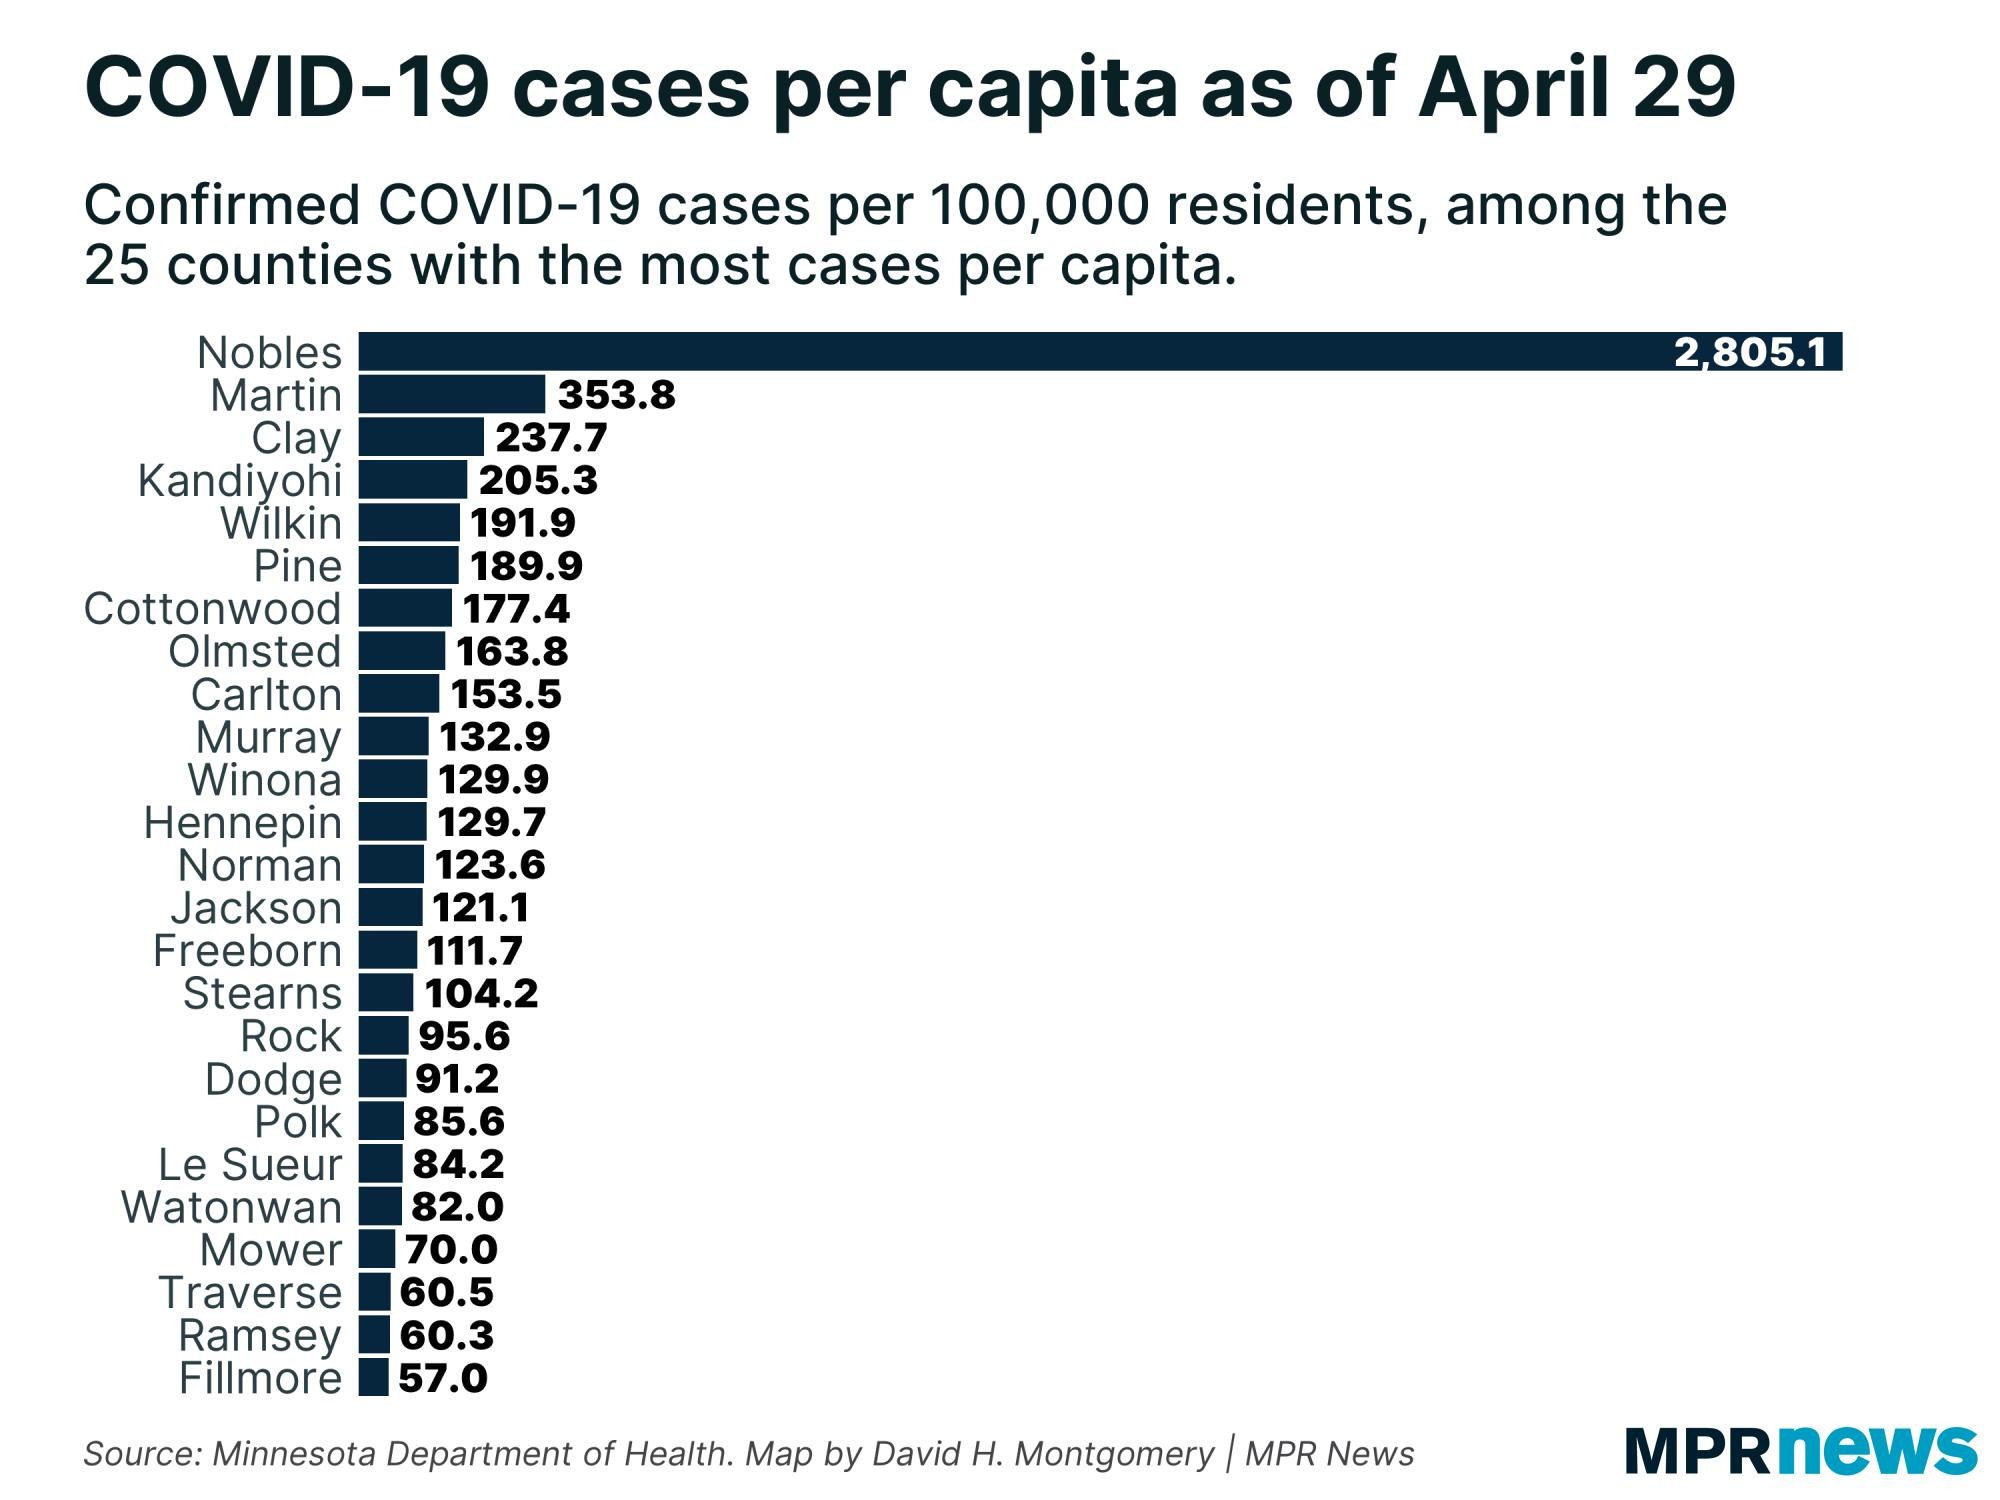 COVID-19 cases per capita in Minnesota counties